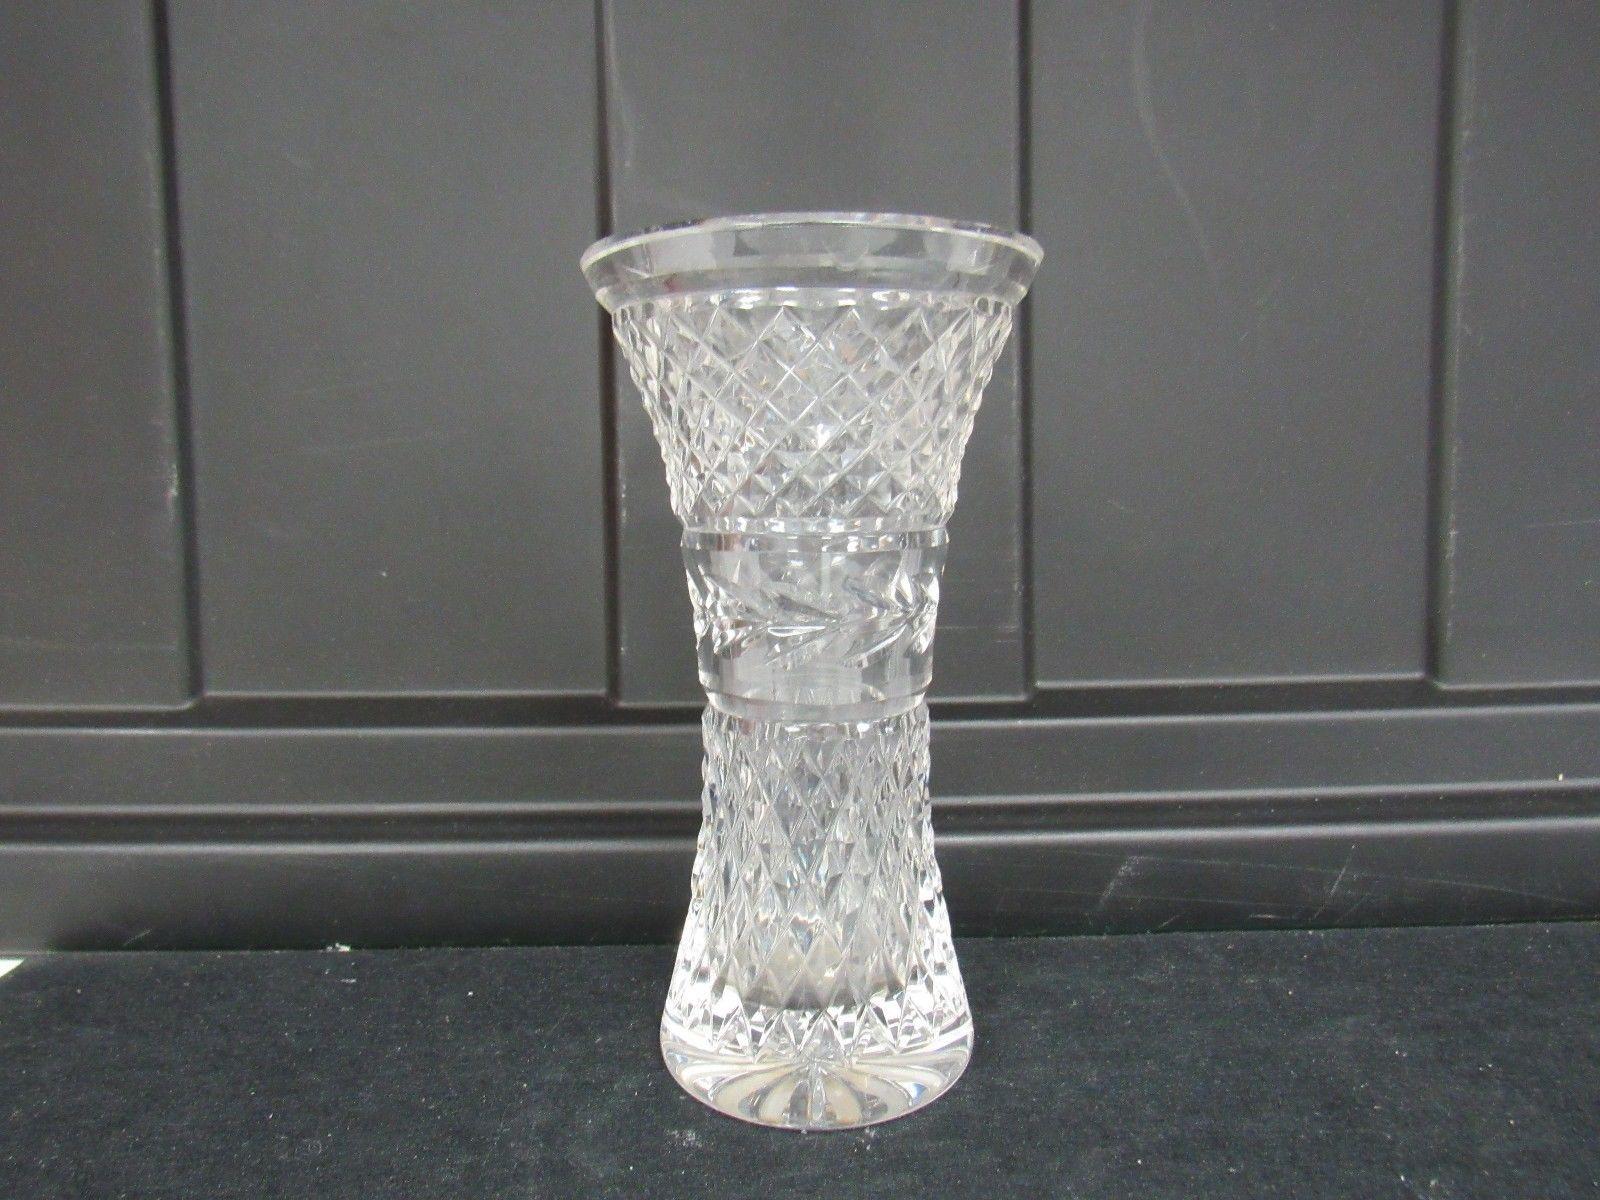 Retired Waterford Crystal Vase Patterns Of Vintage 6 Waterford Crystal Vase Glandore Diamond Laurel Pattern Regarding Vintage 6 Waterford Crystal Vase Glandore Diamond Laurel Pattern 2978k